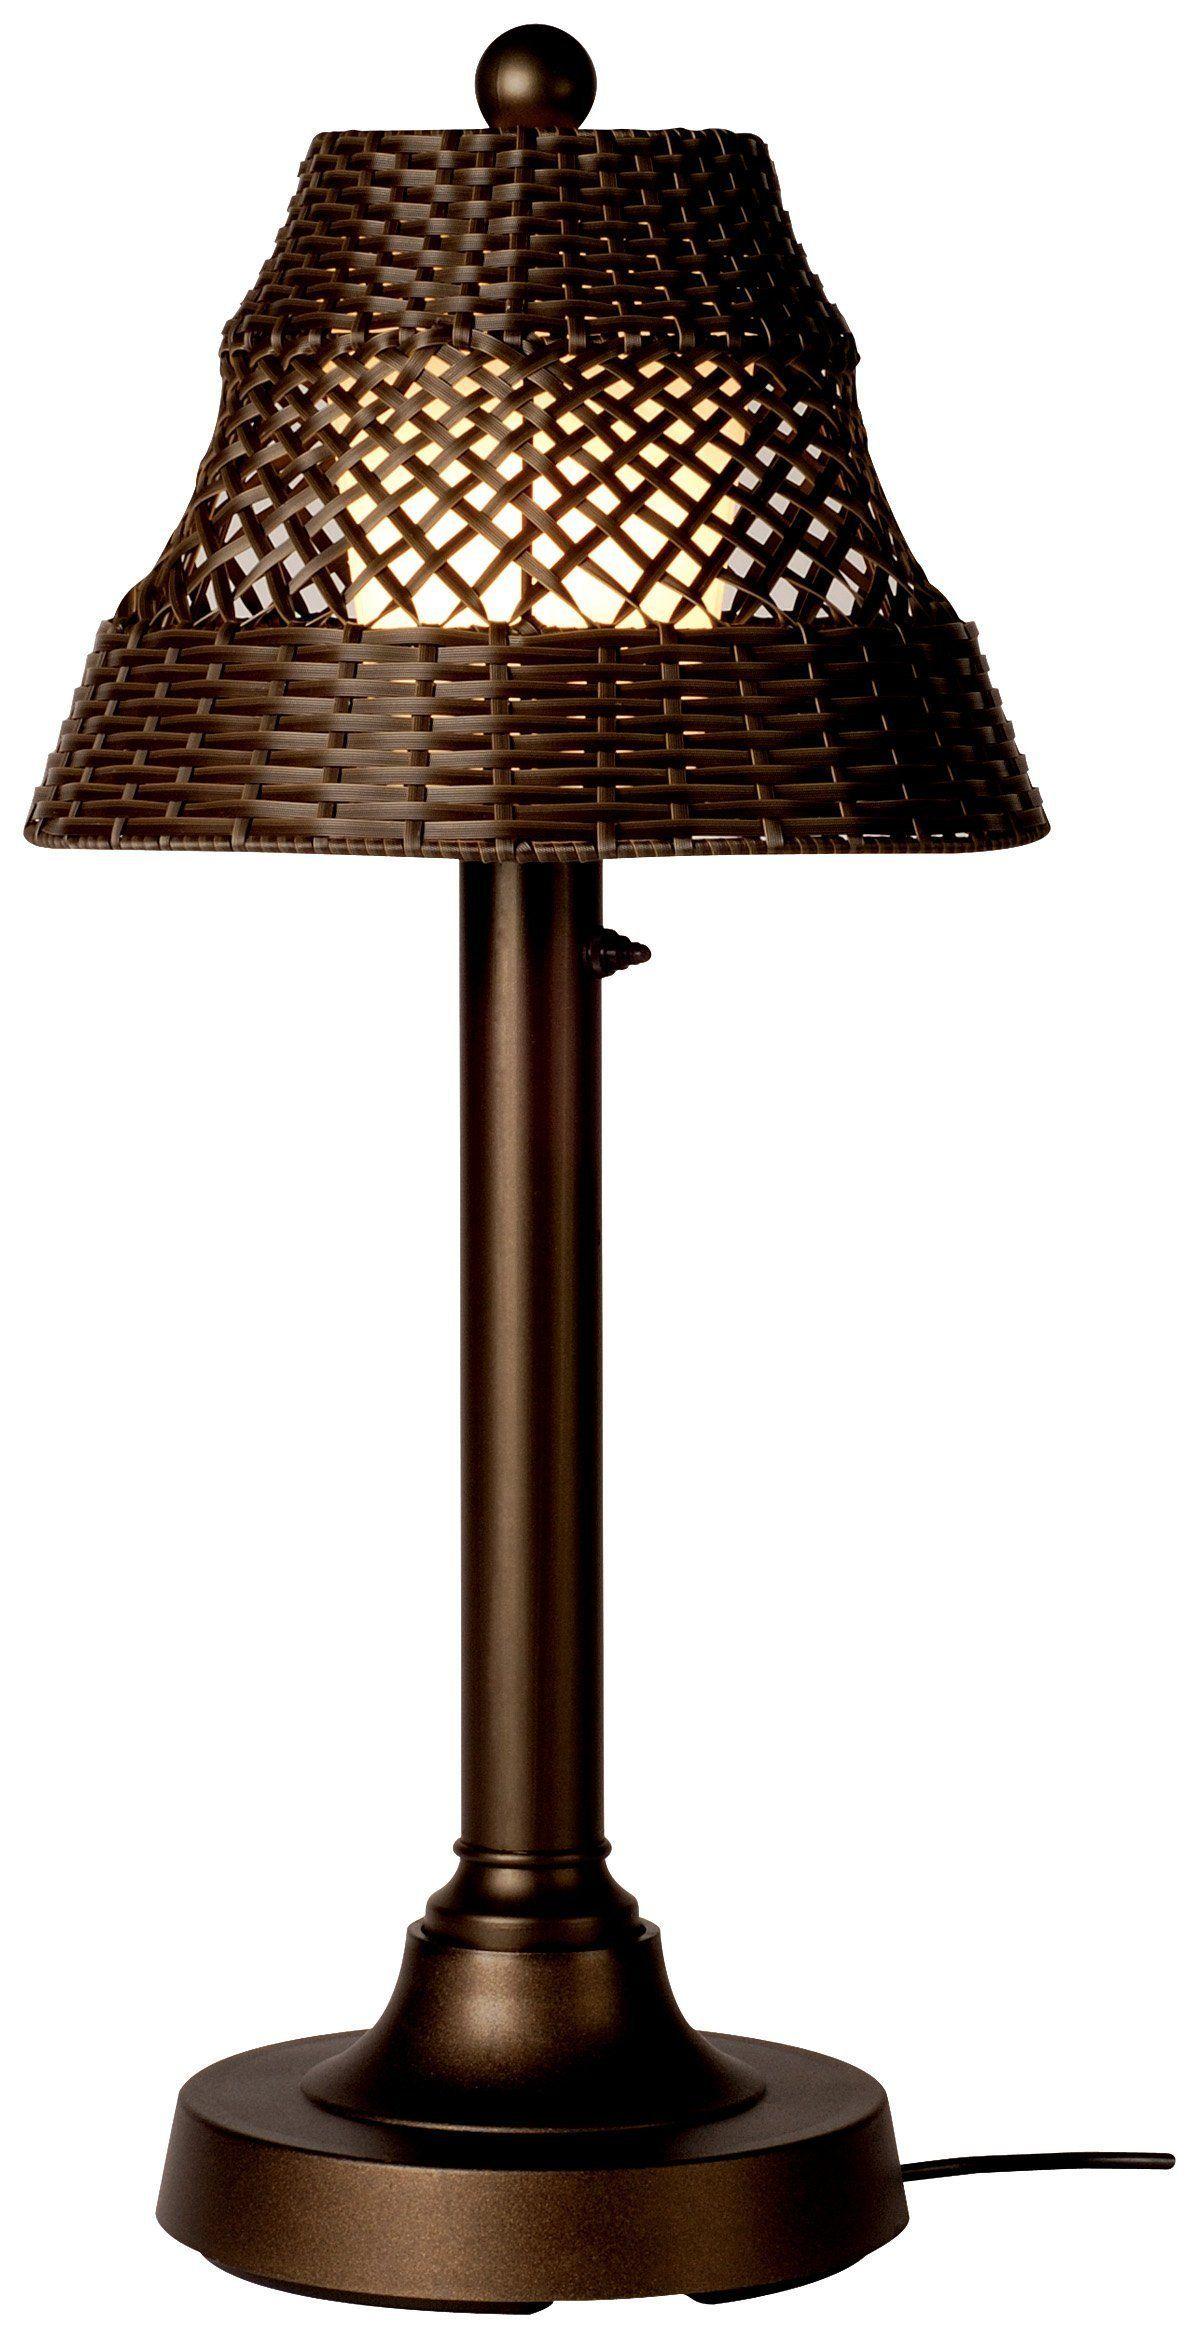 Java 15227 Bronze 30inch Table Lamp With Walnut Wicker